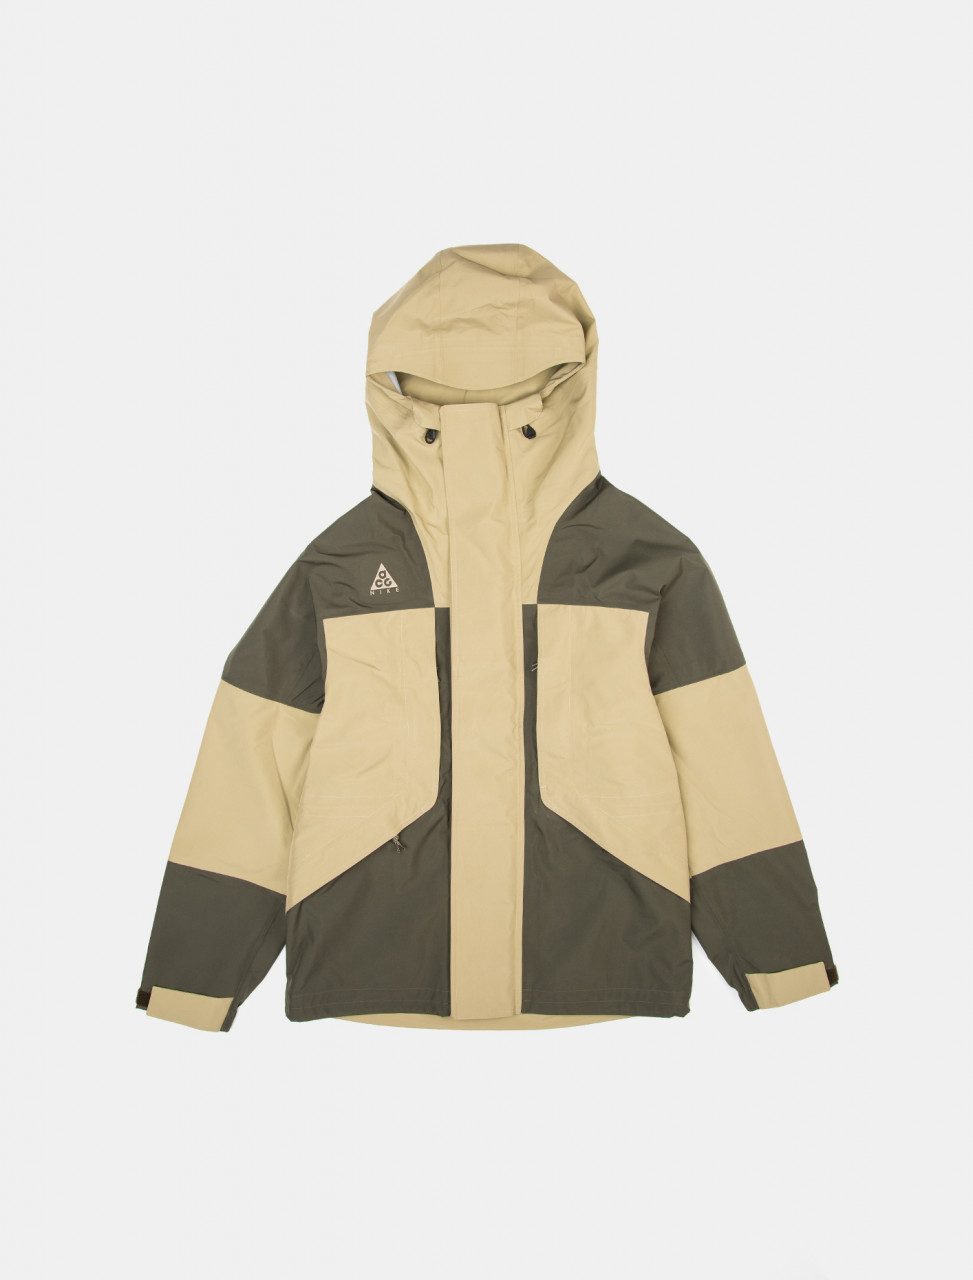 Nike ACG Hooded GORE-Tex Jacket